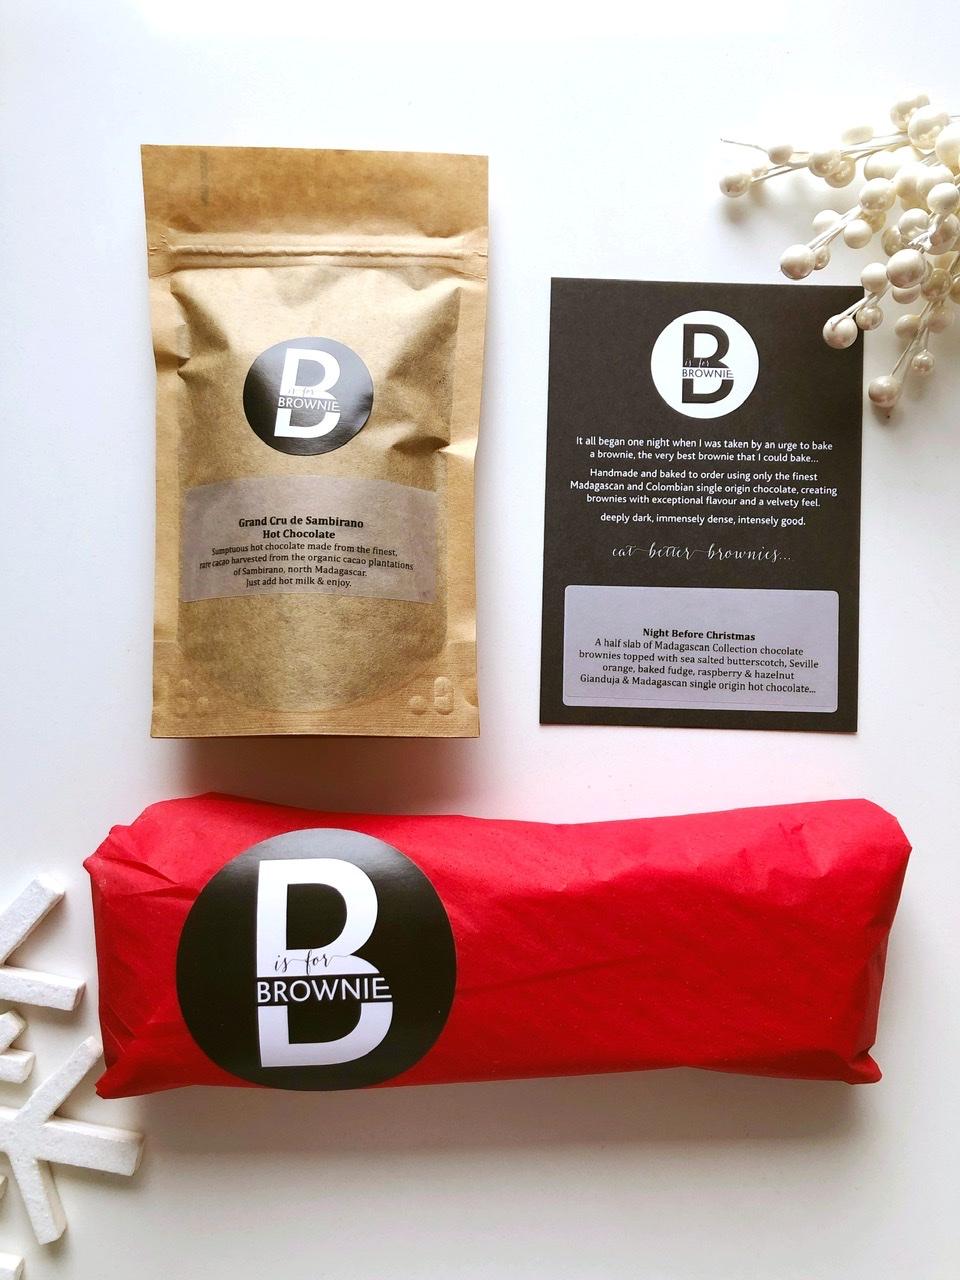 Night Before Christmas Brownies & Hot Chocolate – serves 5